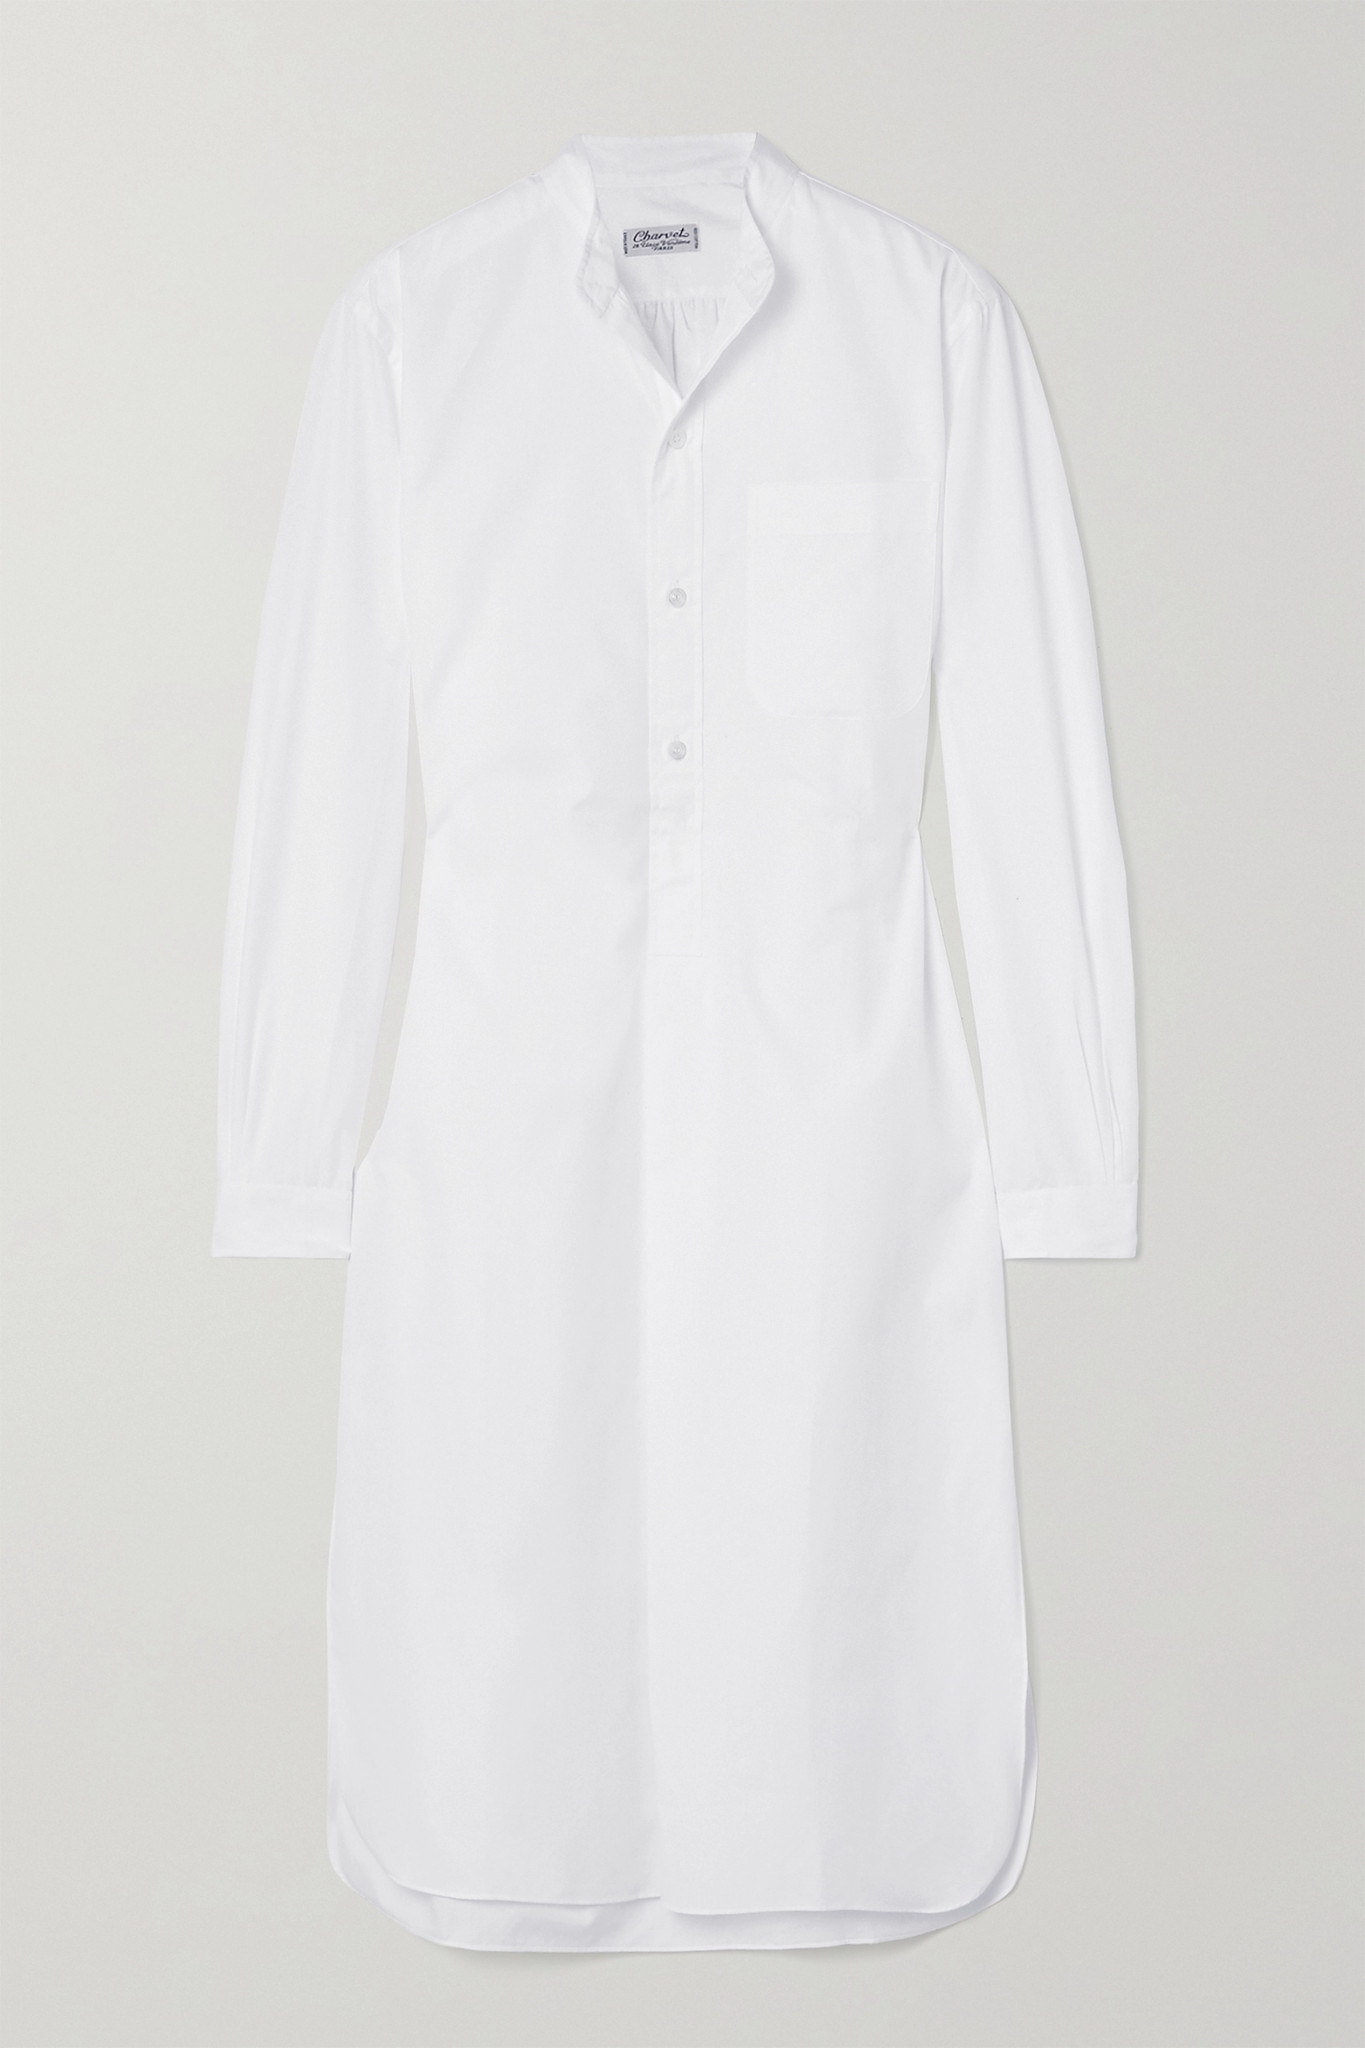 CHARVET - Elysee 大廓形纯棉府绸睡裙 - 白色 - small